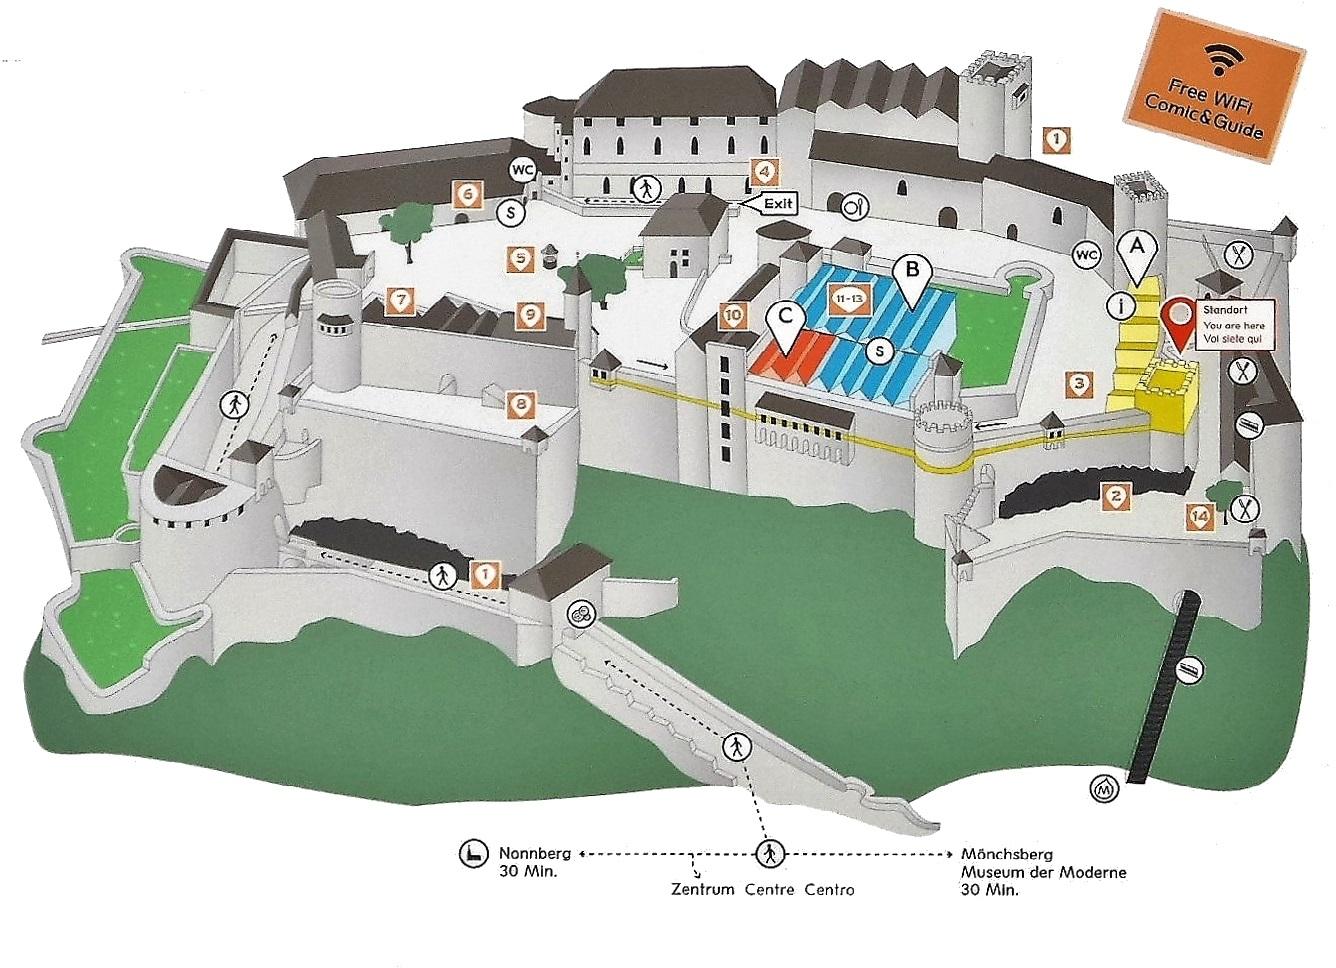 薩爾斯堡要塞地圖